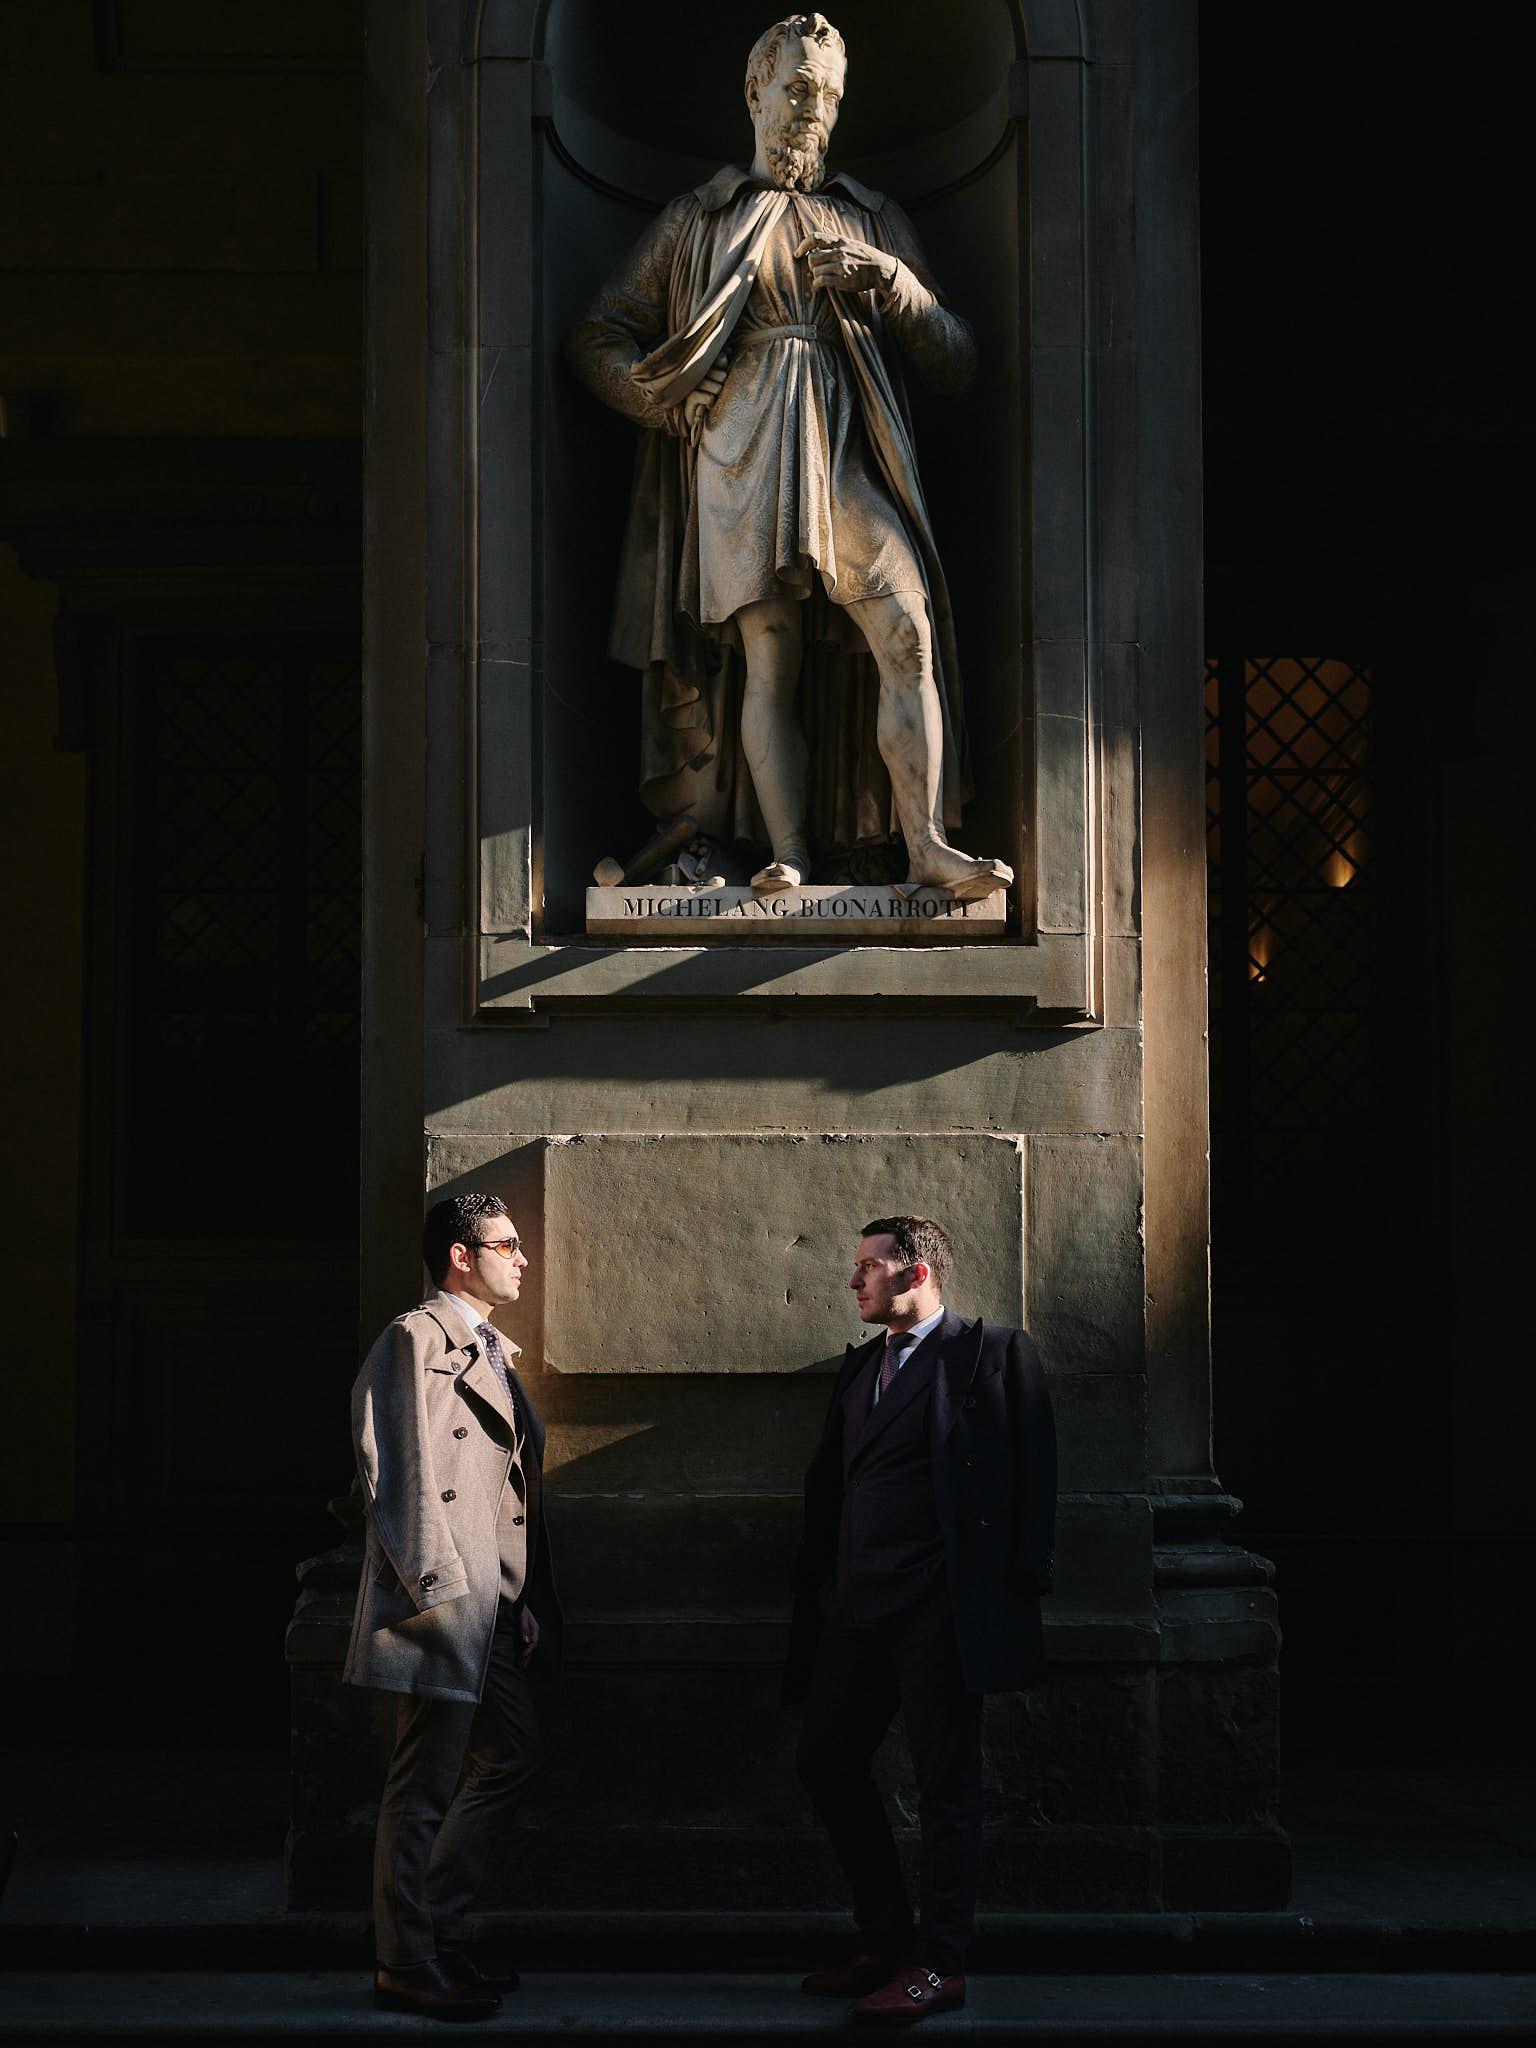 Blandin Delloye Florence Italy Street Fashion with Michelangelo Buonaroti Sculpture